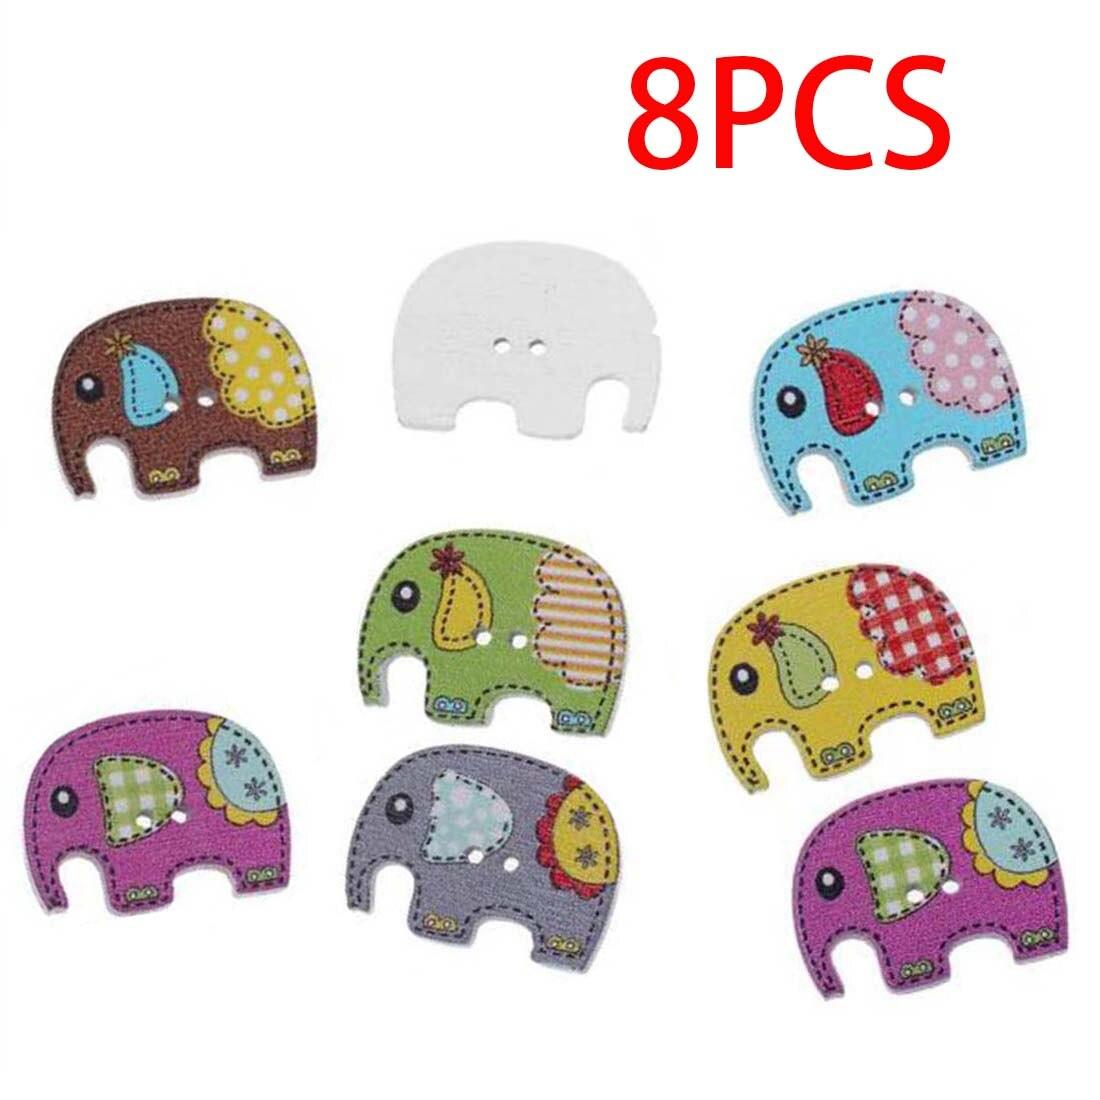 ᐅ8 unids color mezclado madera Costura botón scrapbooking Elefante ...